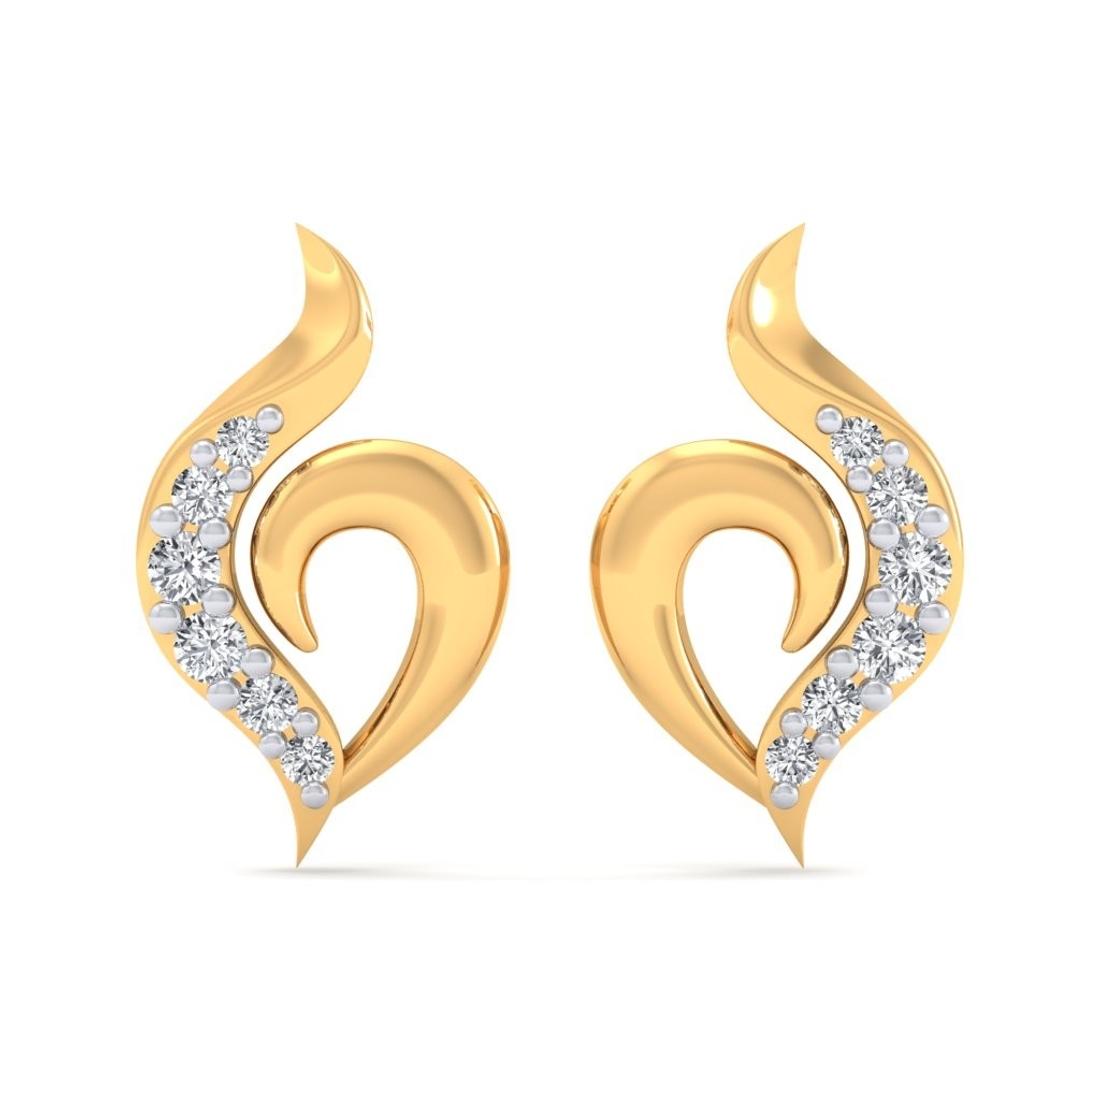 Sarvada Jewels' The Vidonia Earrings